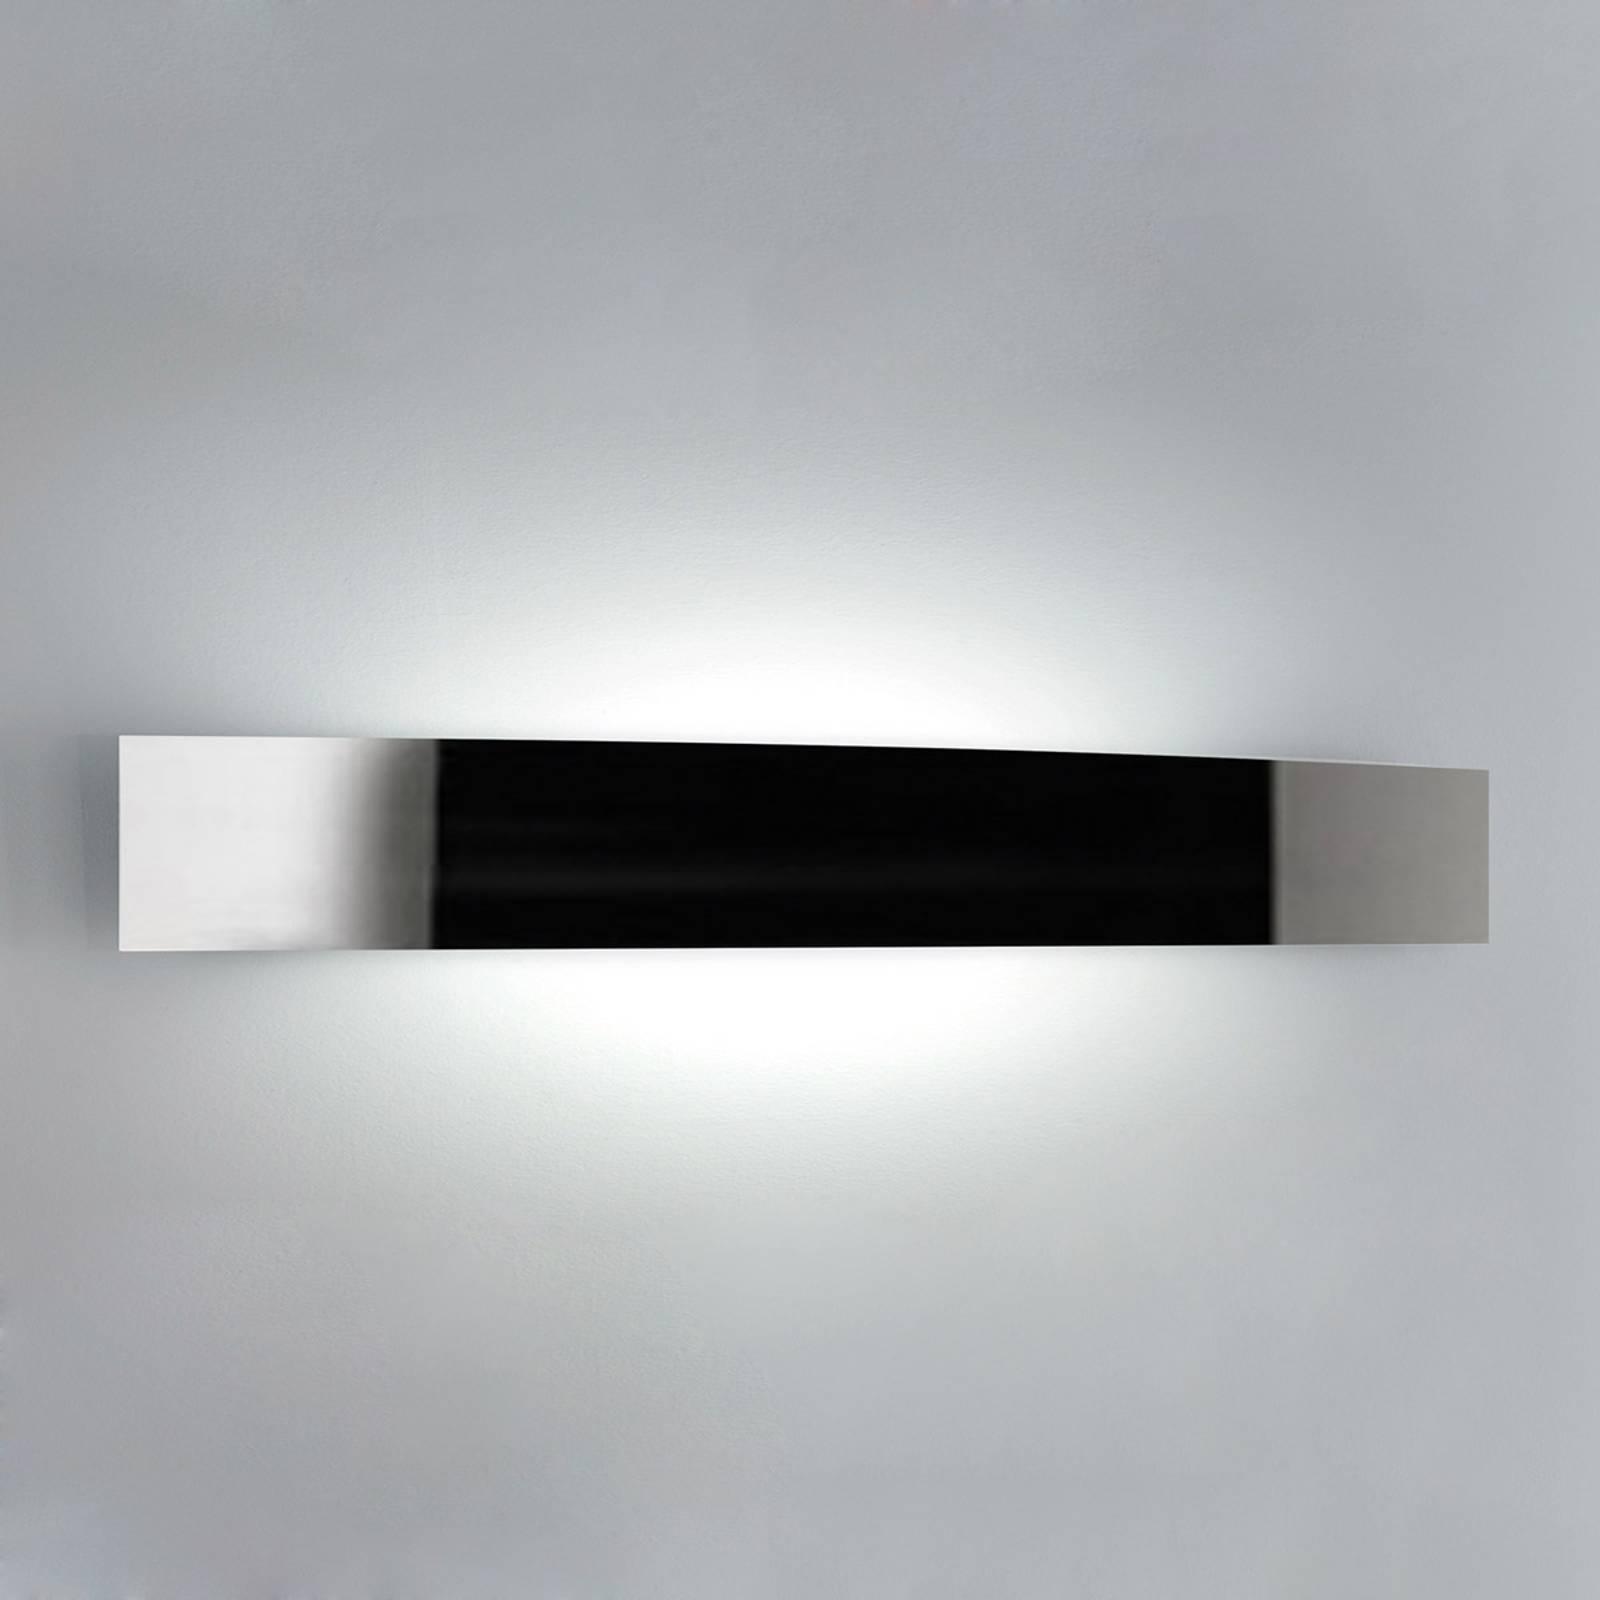 Mooie wandlamp RIGA, 56 cm, rvs